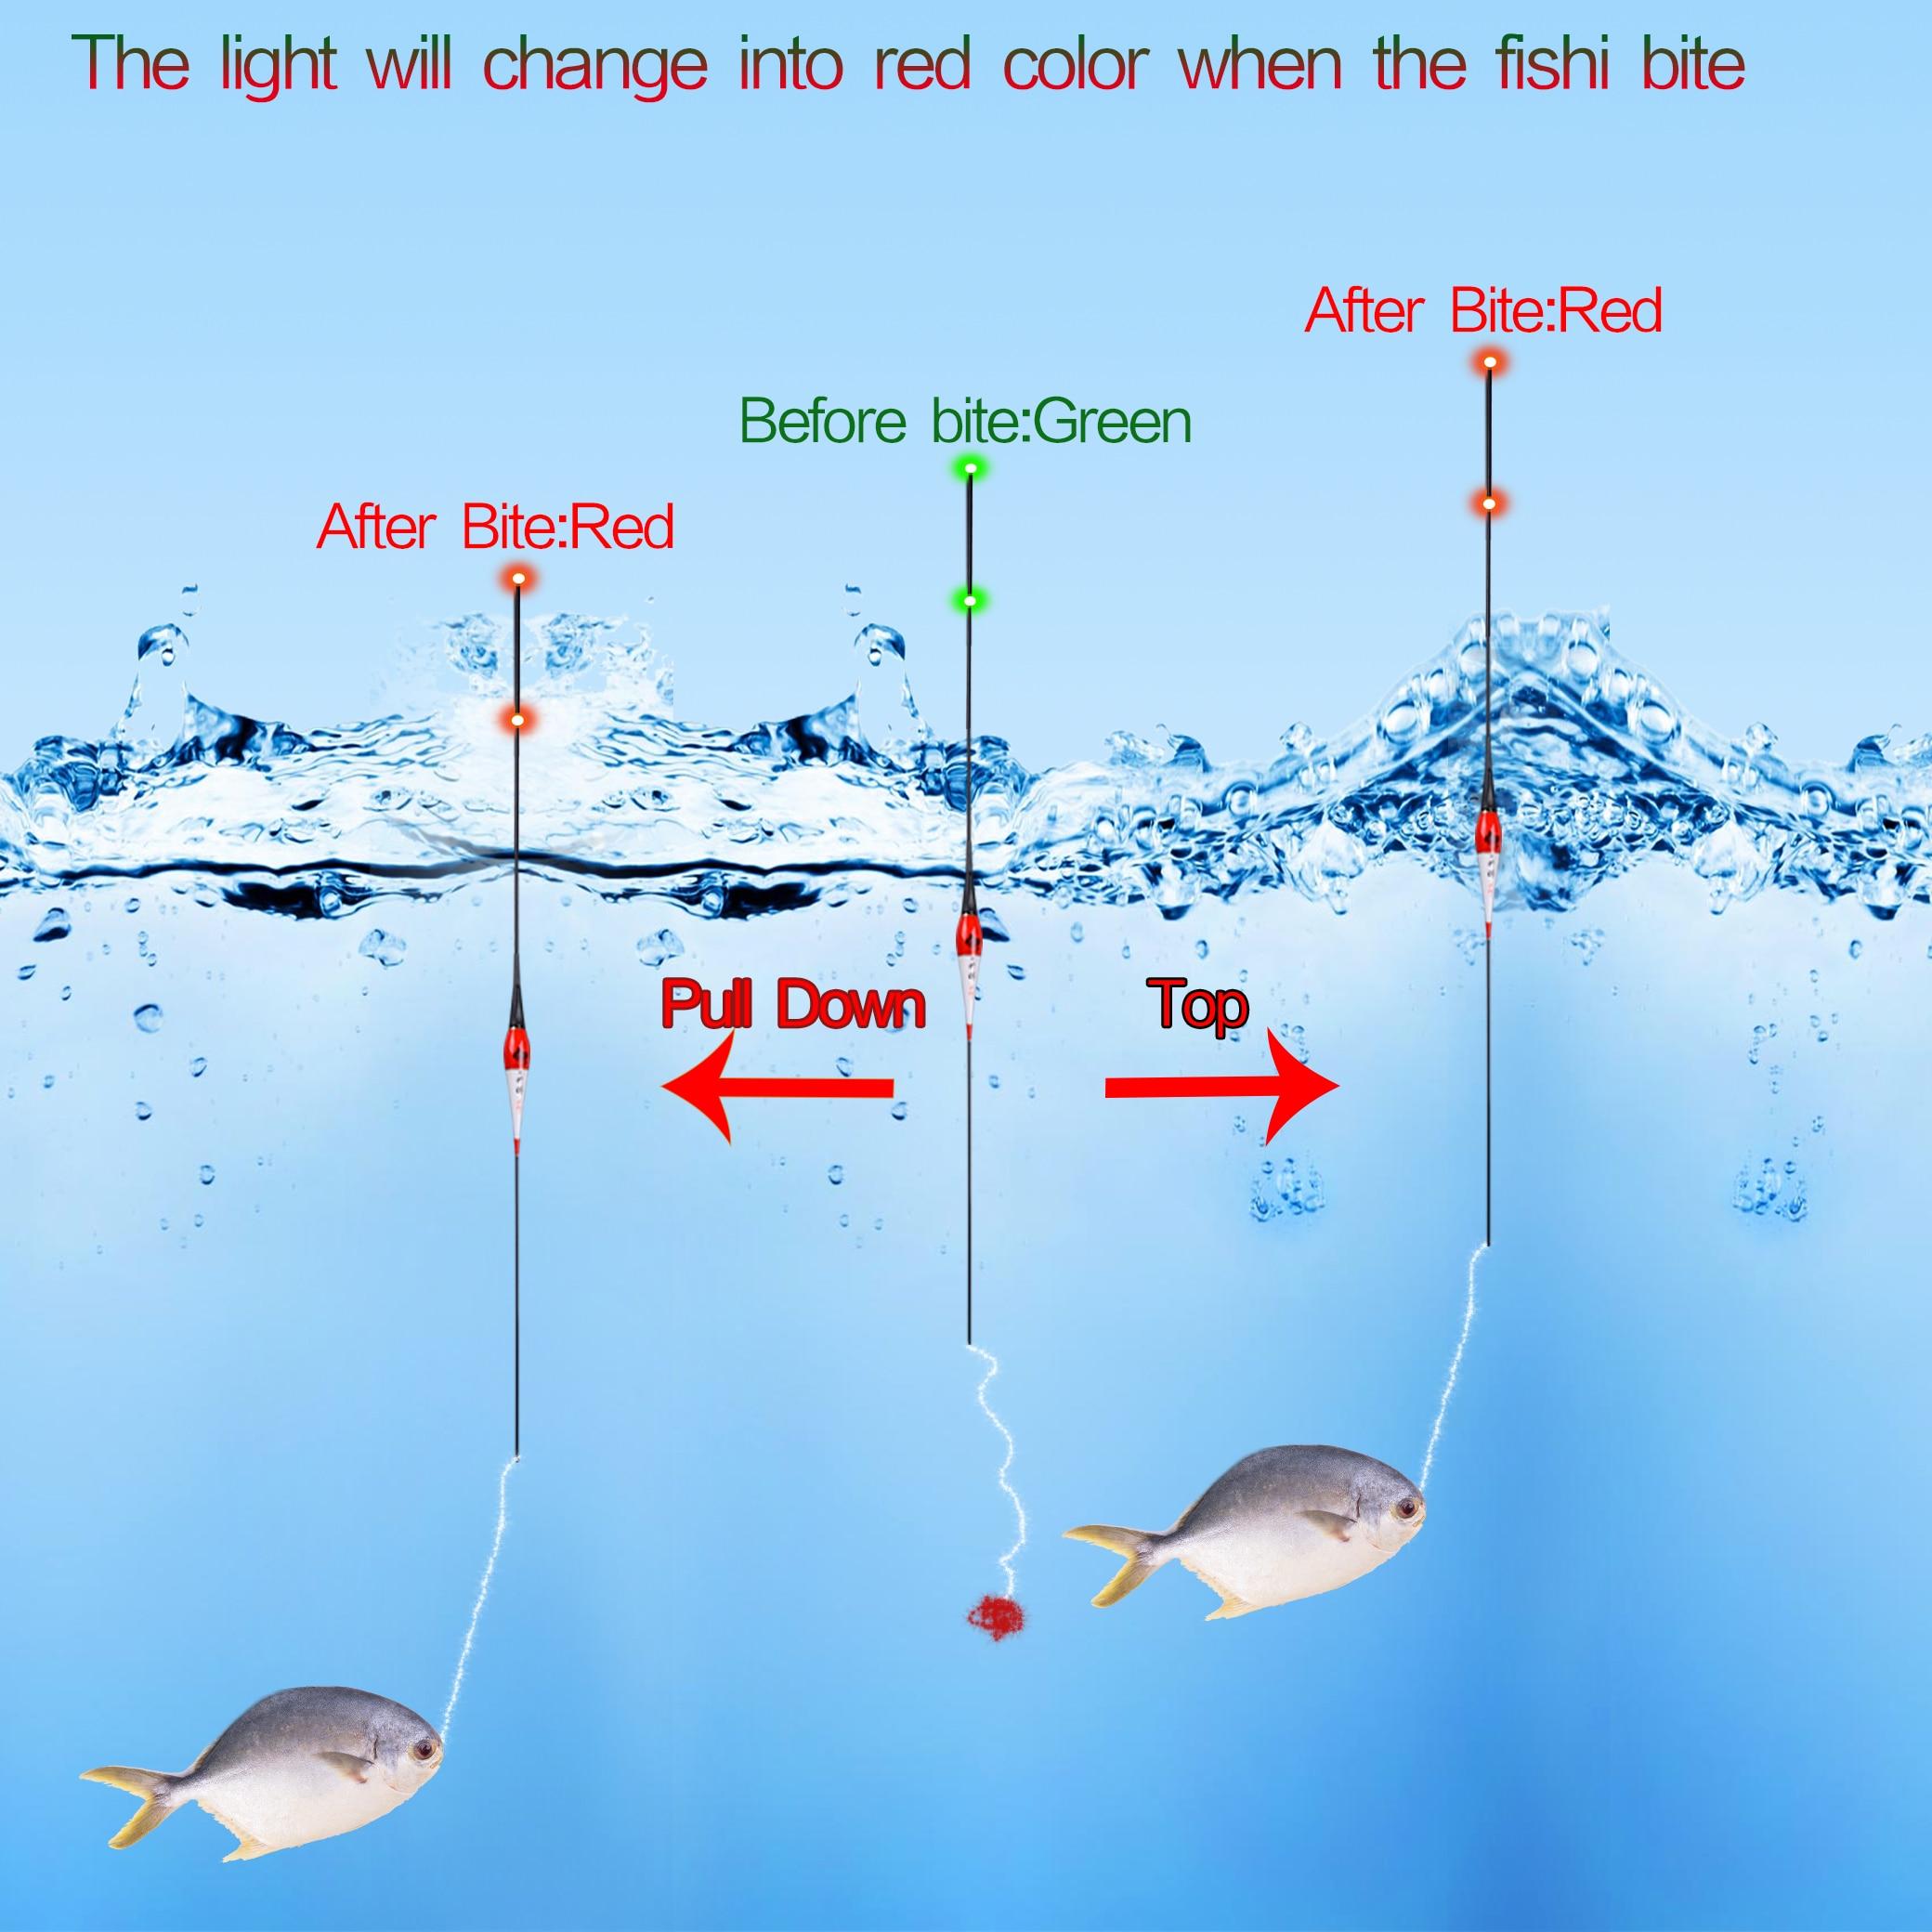 Flotador de pesca inteligente alarma de mordedura de pez cebo LED luz cambio de Color pesca led recuerda automáticamente Bobber de pesca brillante